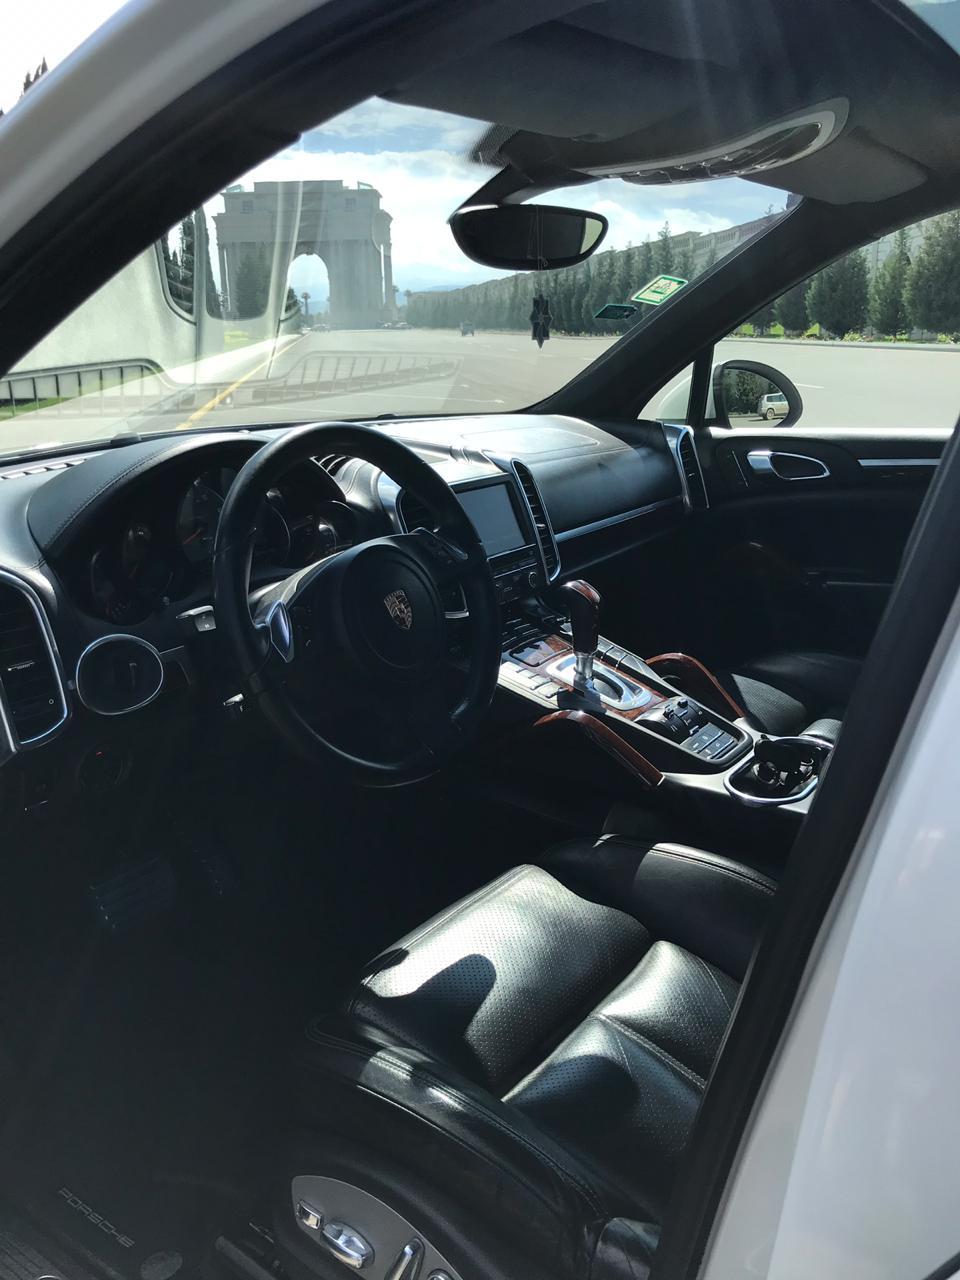 Porsche Cayenne 4.8(lt) 2011 İkinci əl  $40000